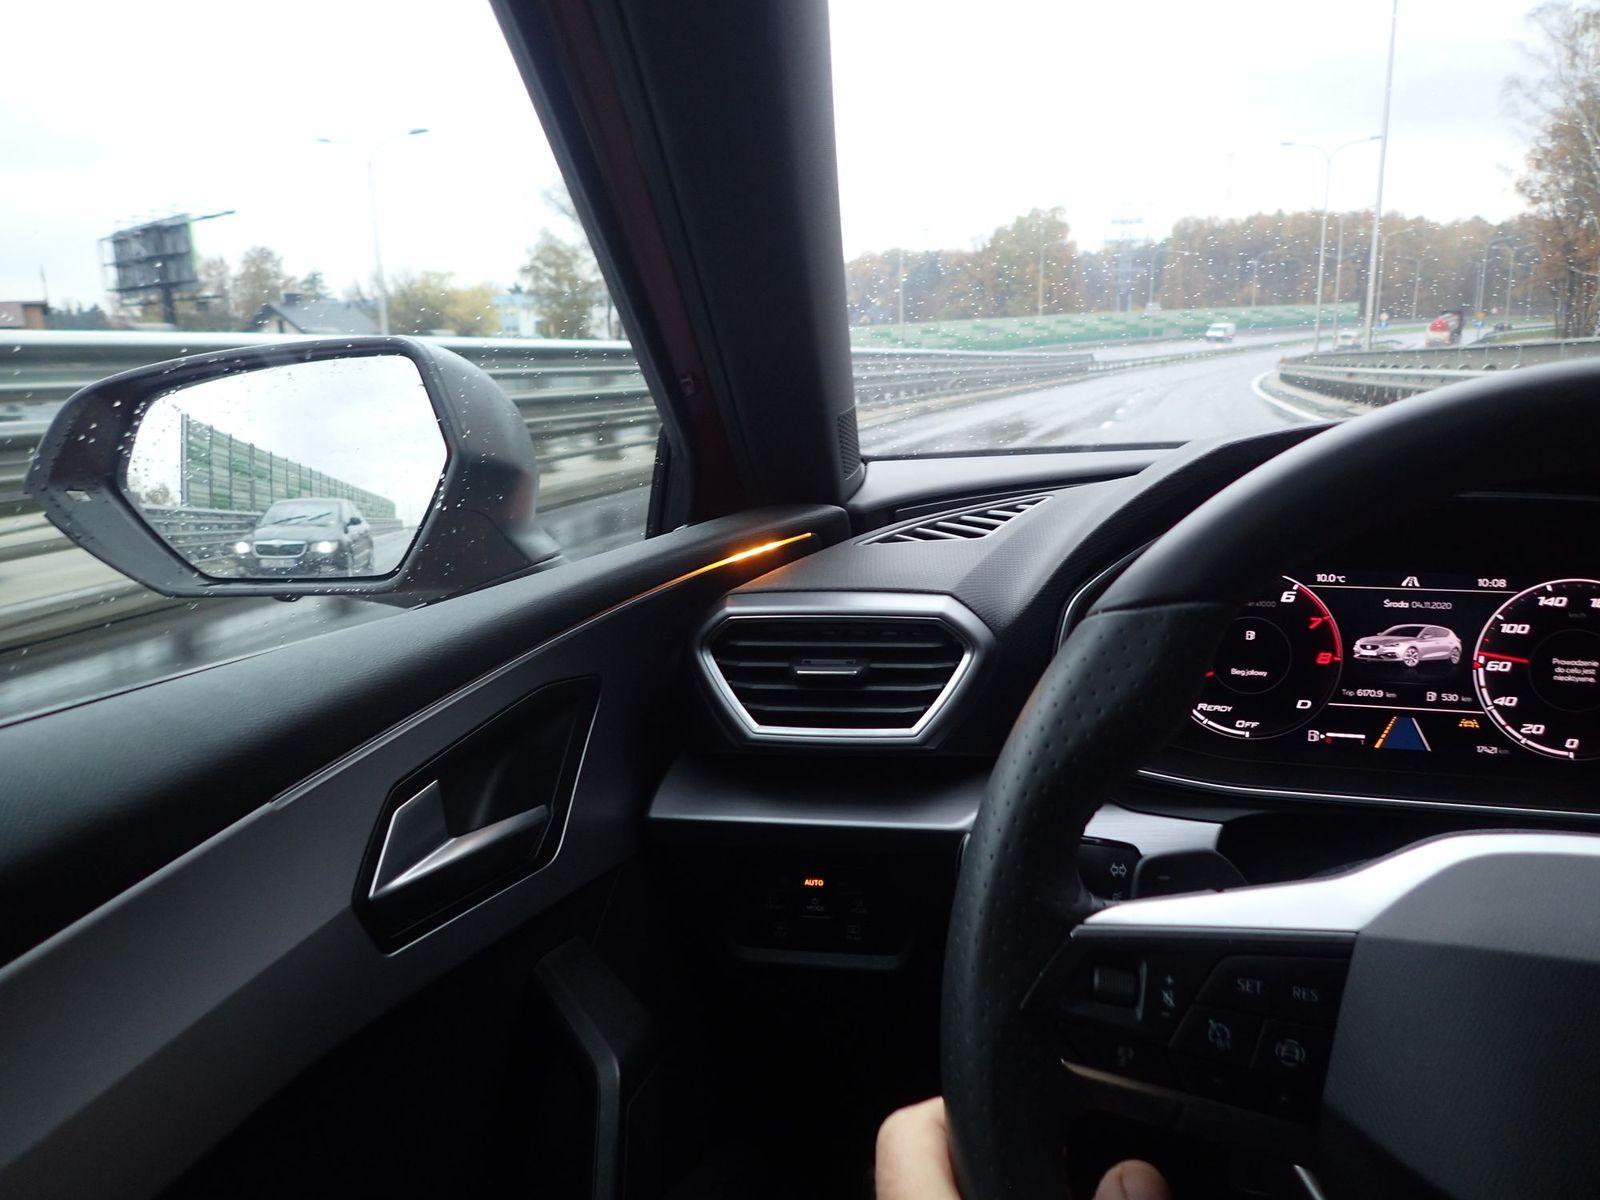 Seat_Leon_test2020_10